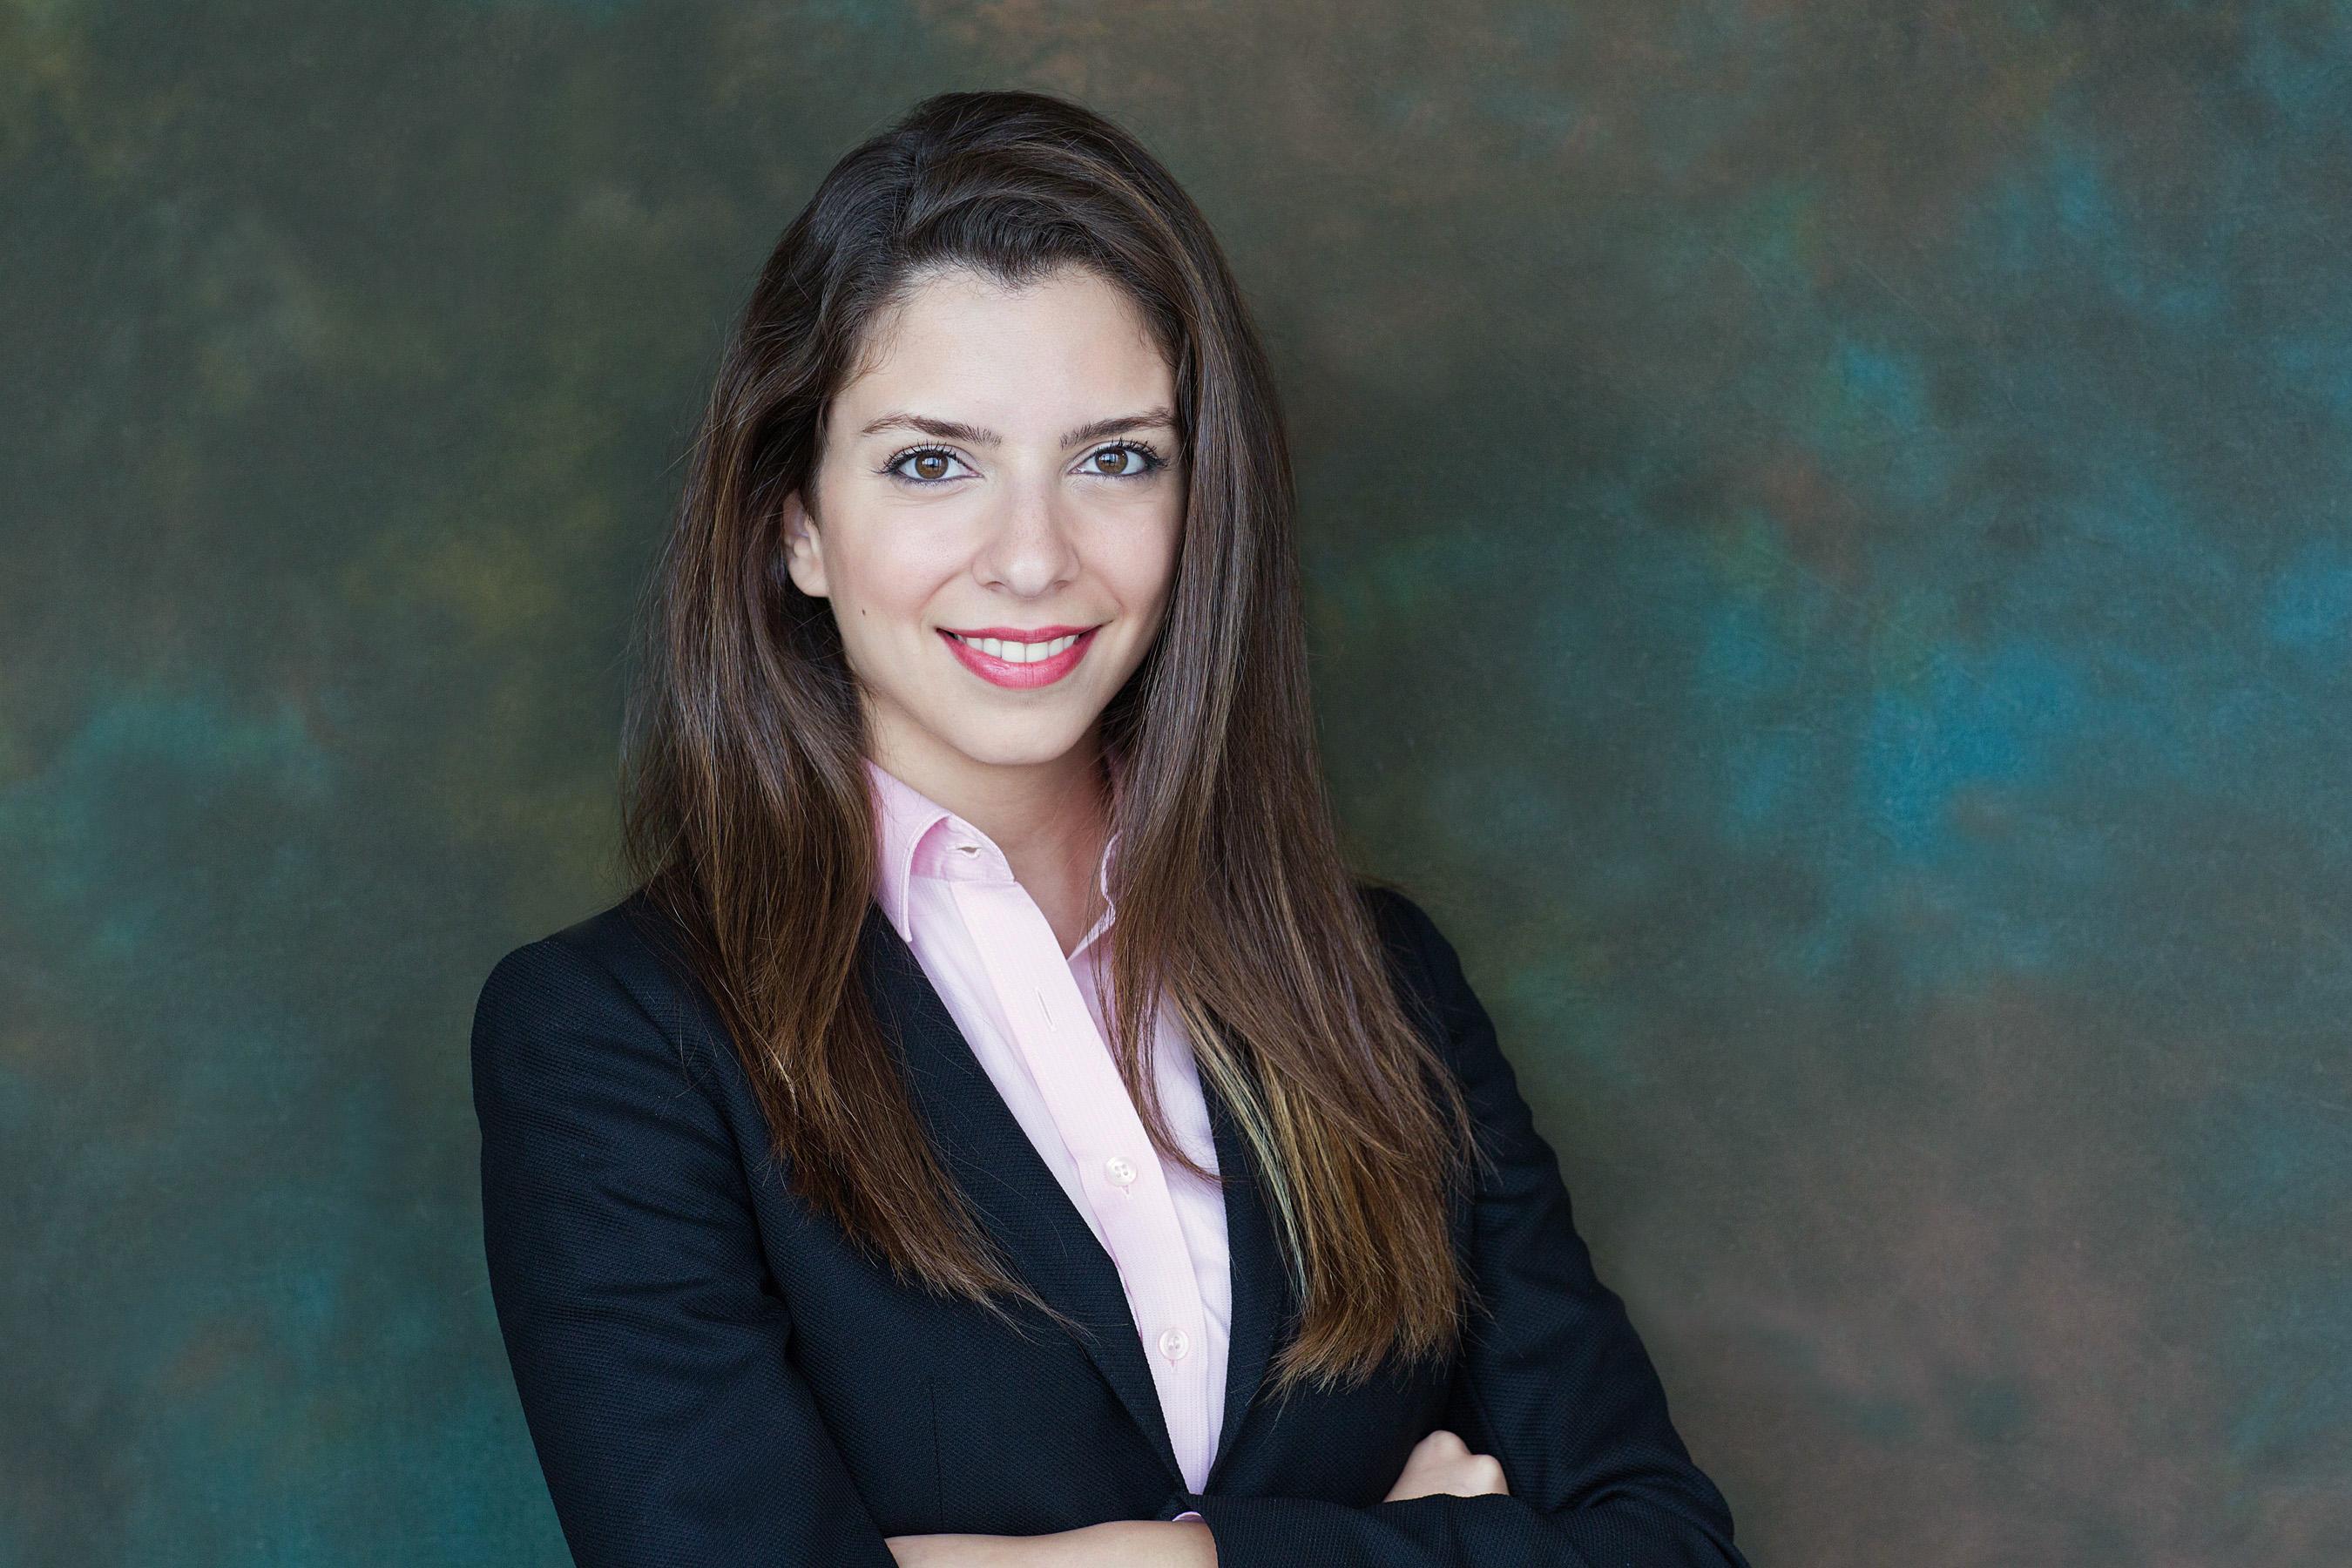 Carla Slim, Standard Chartered Bank